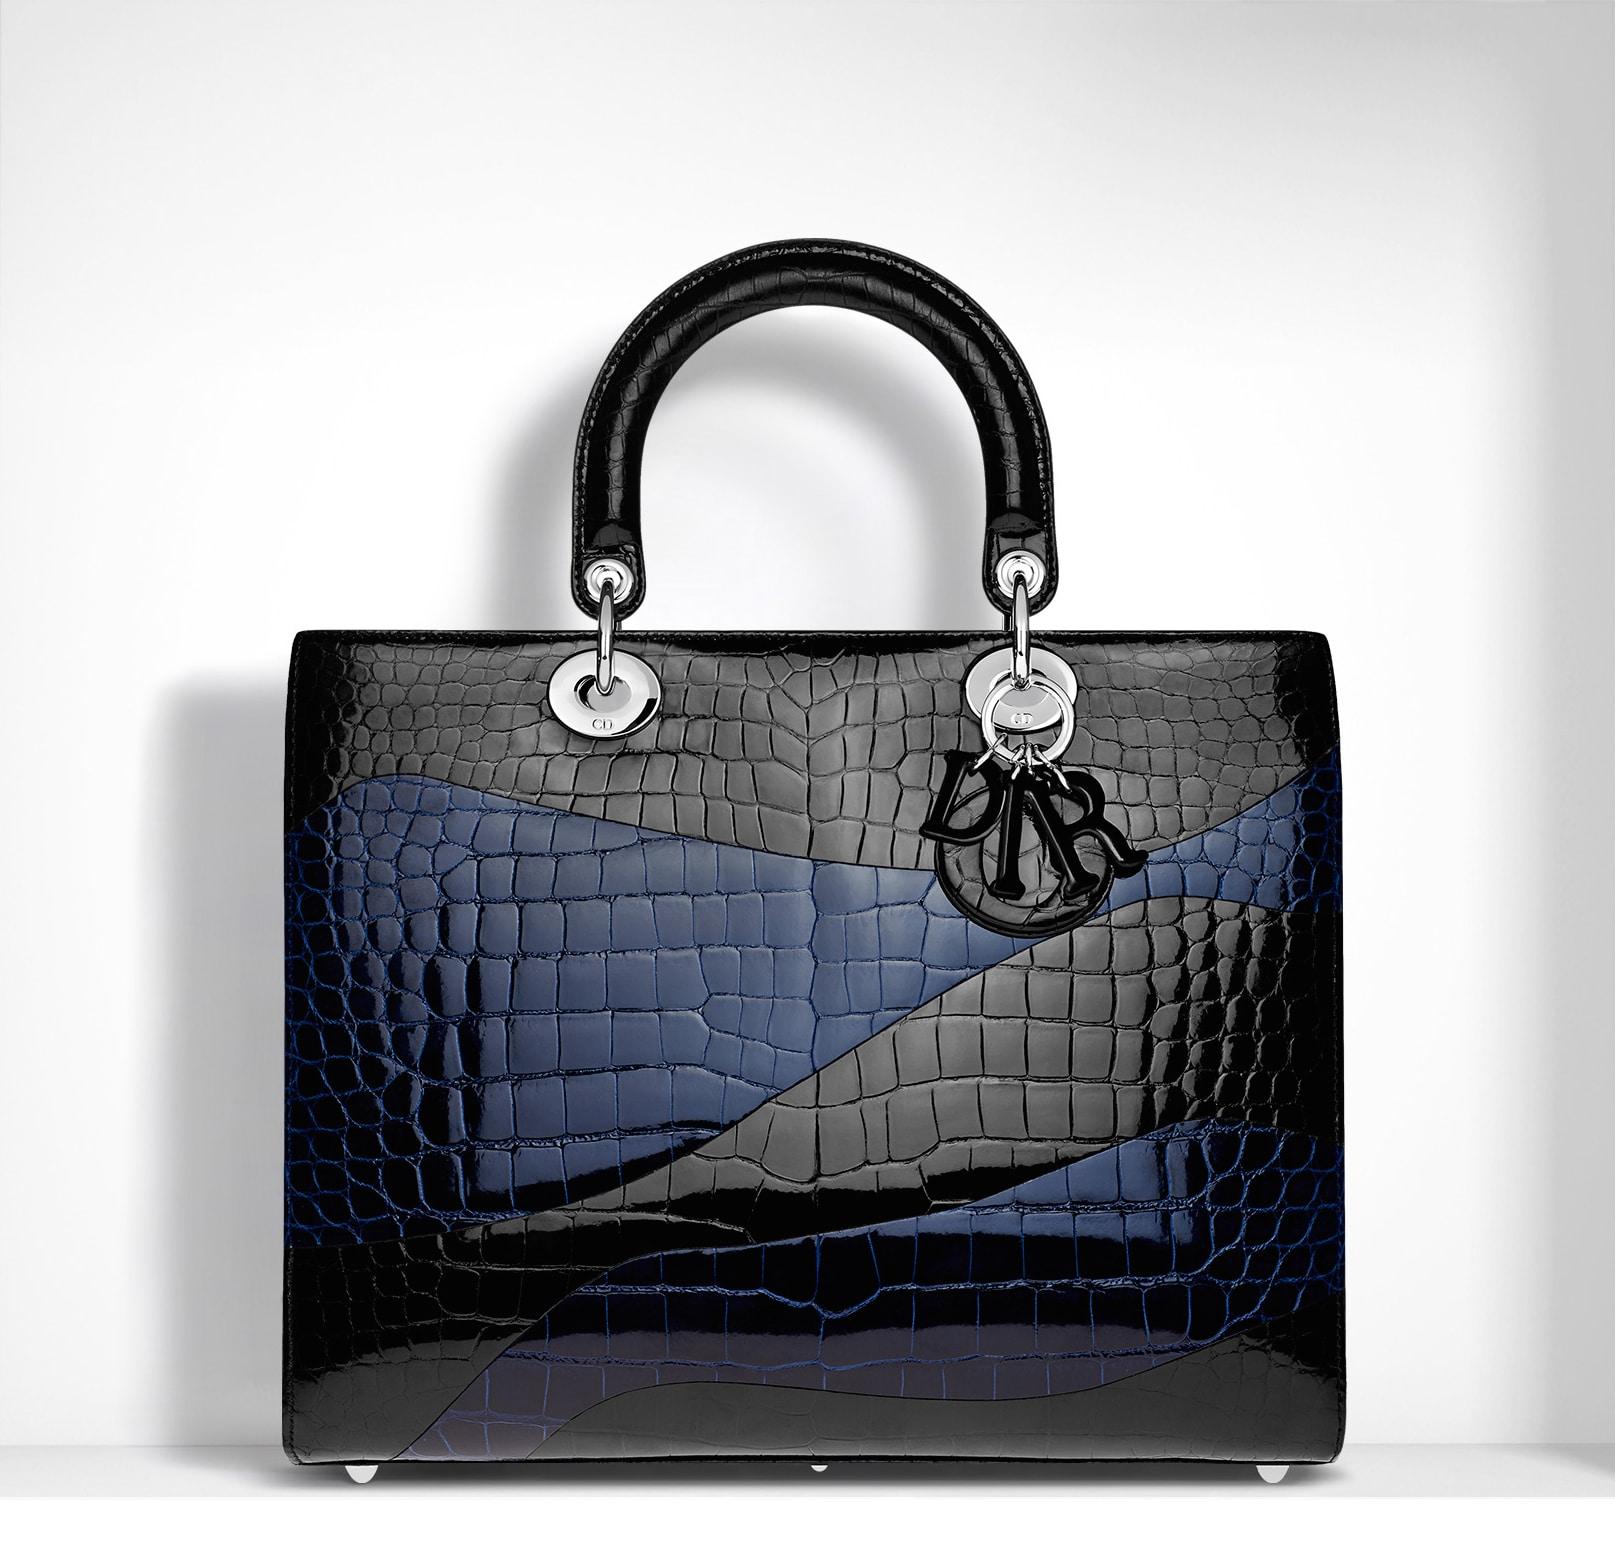 Dior Black Blue Marquetry with Zebra Prints Lady Dior Large Bag d8cbda8330b41